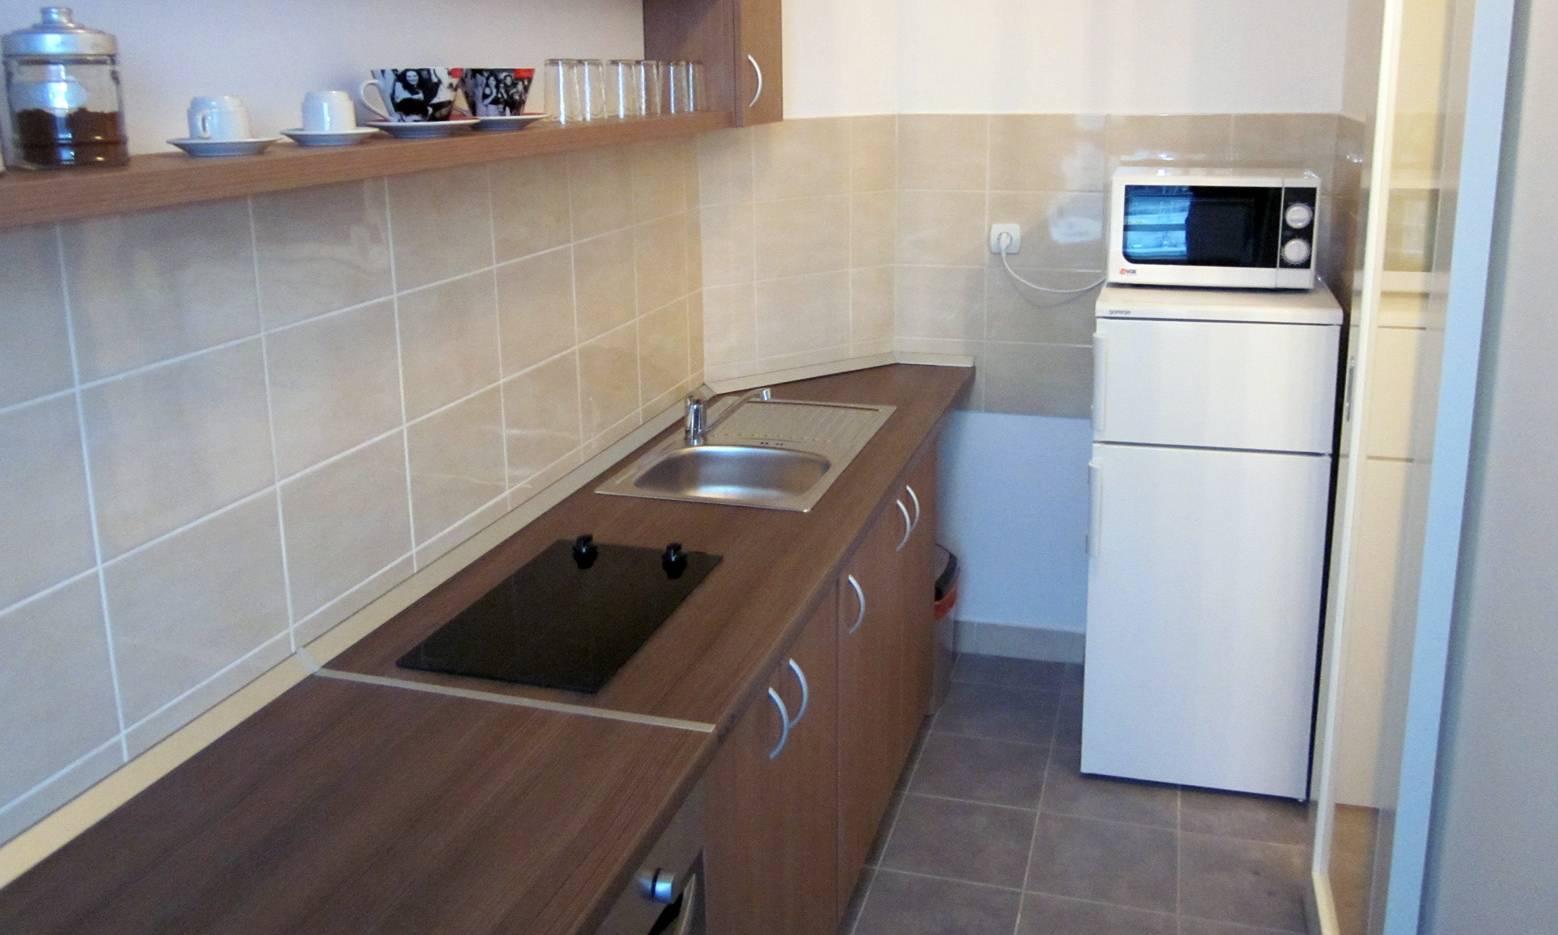 apartman Zumbul, Belvil, Beograd